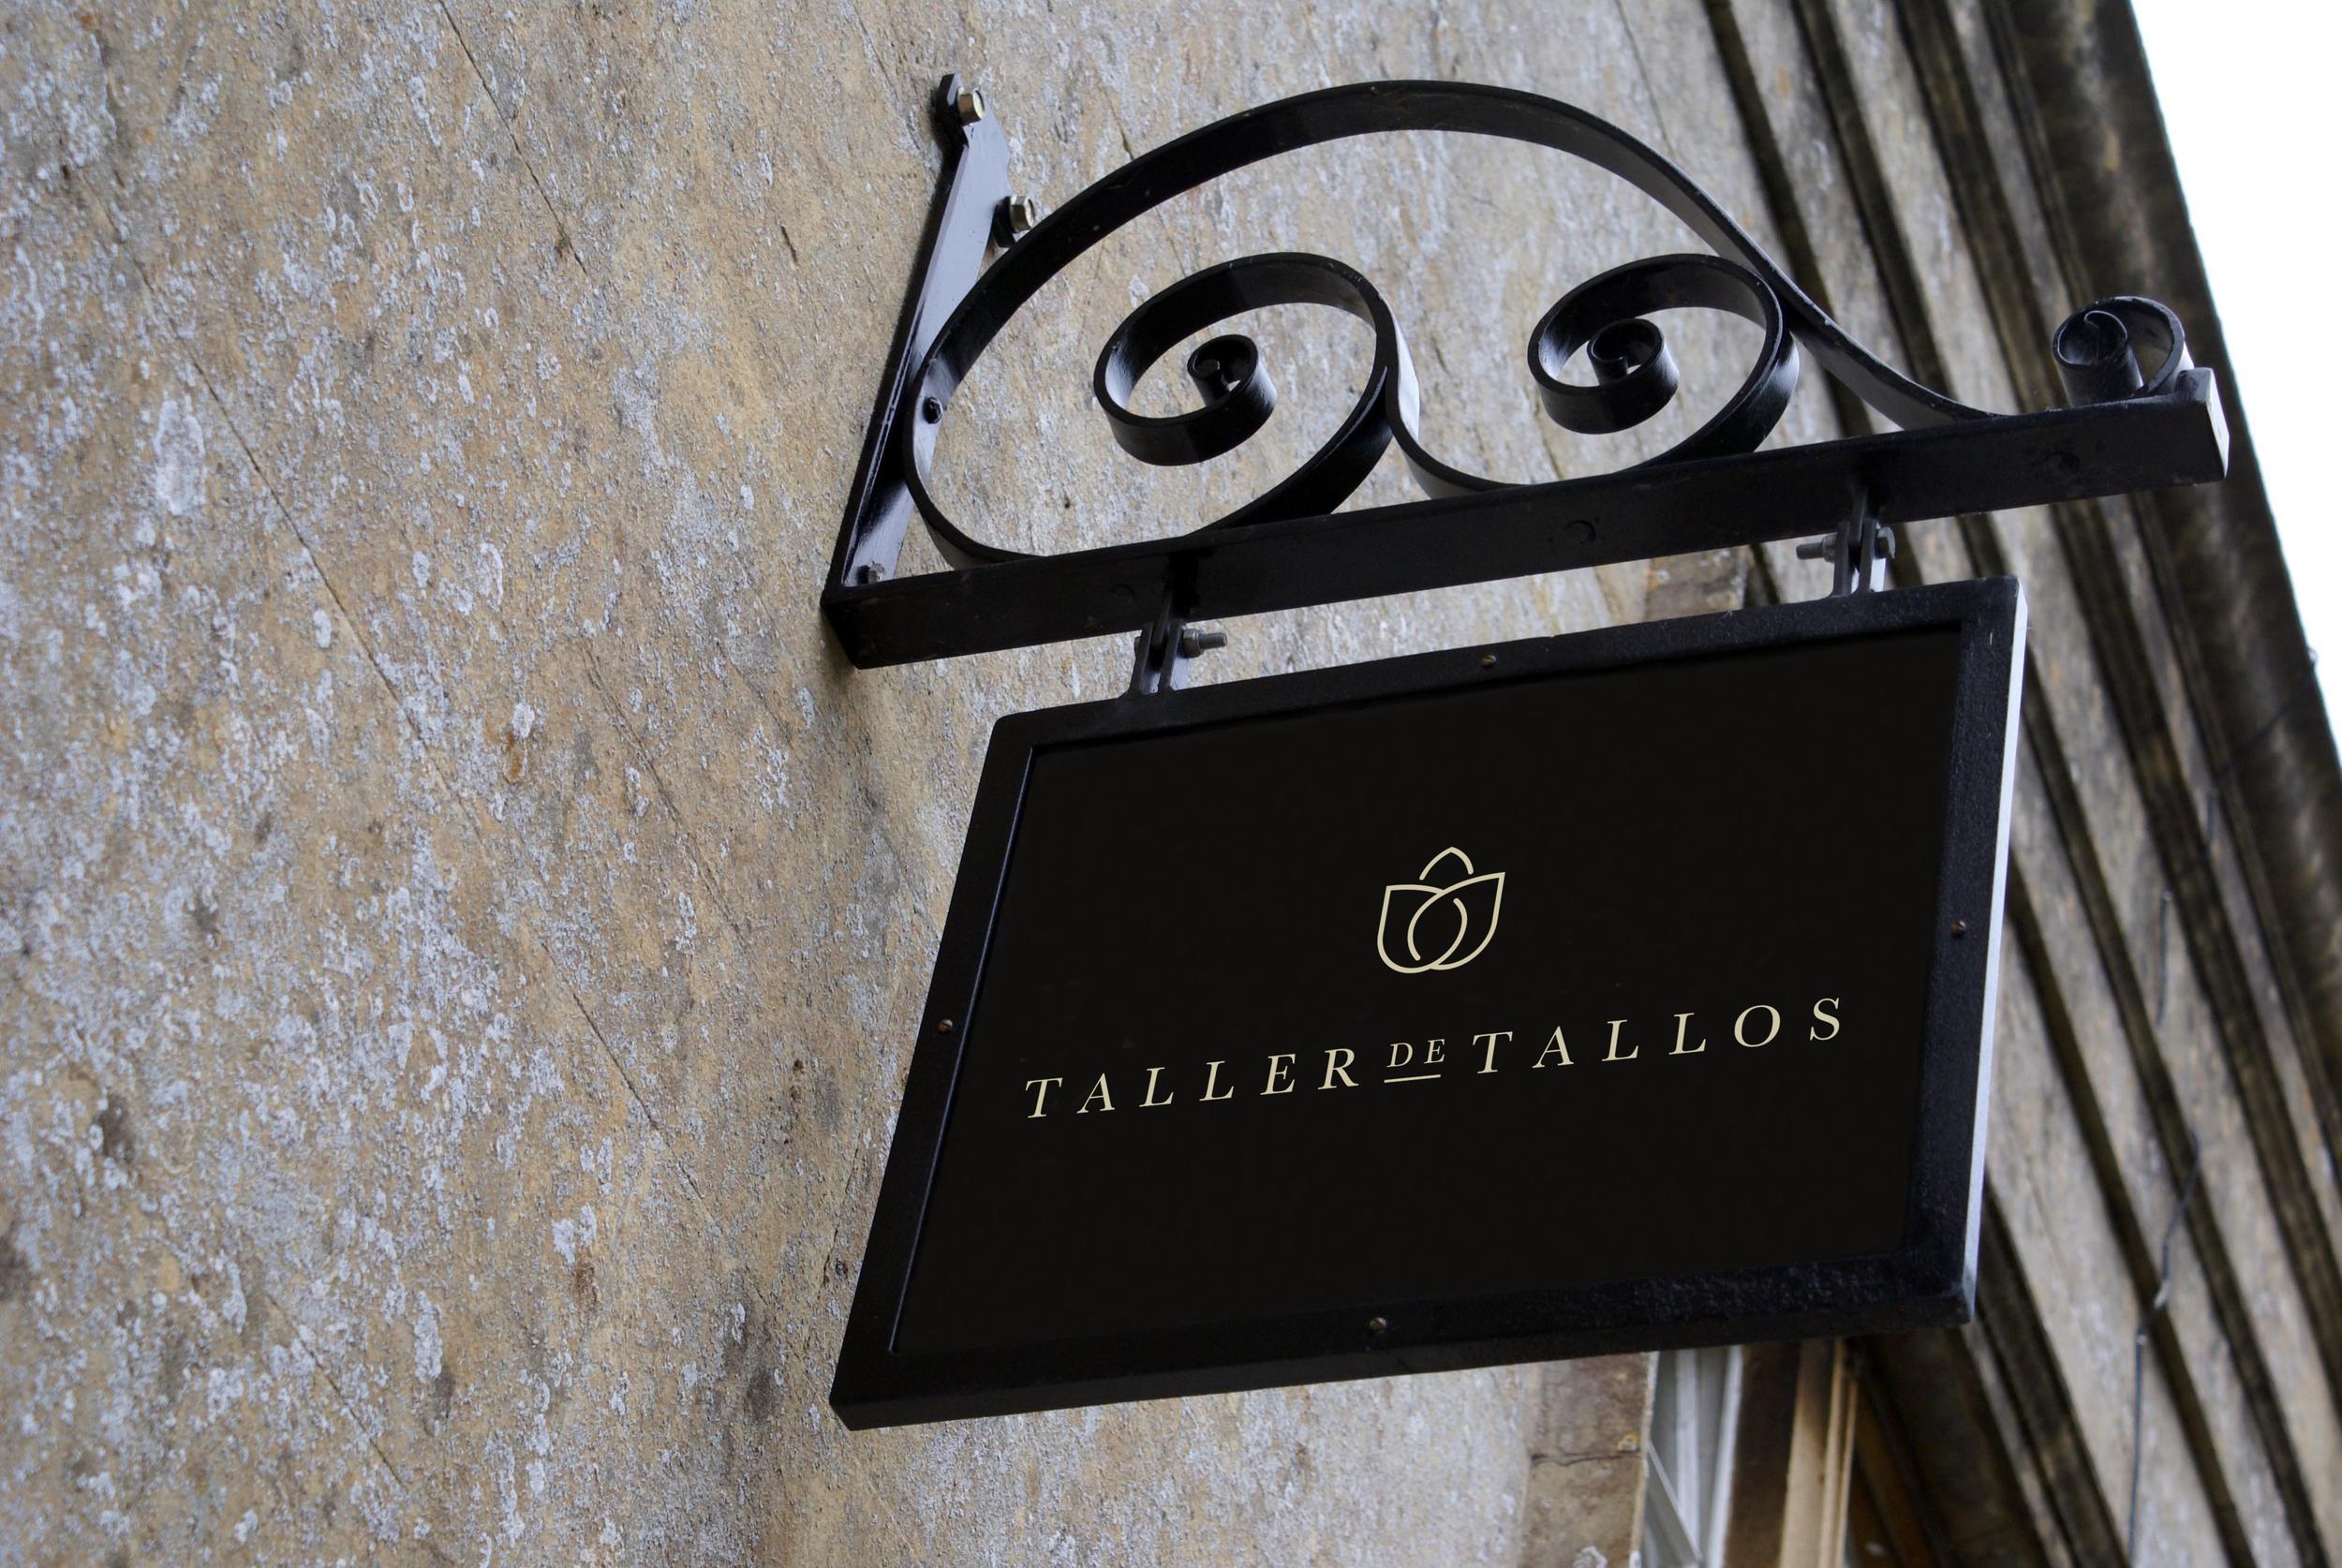 Taller+de+Tallos+Ambientacion+floral+bodas.jpg